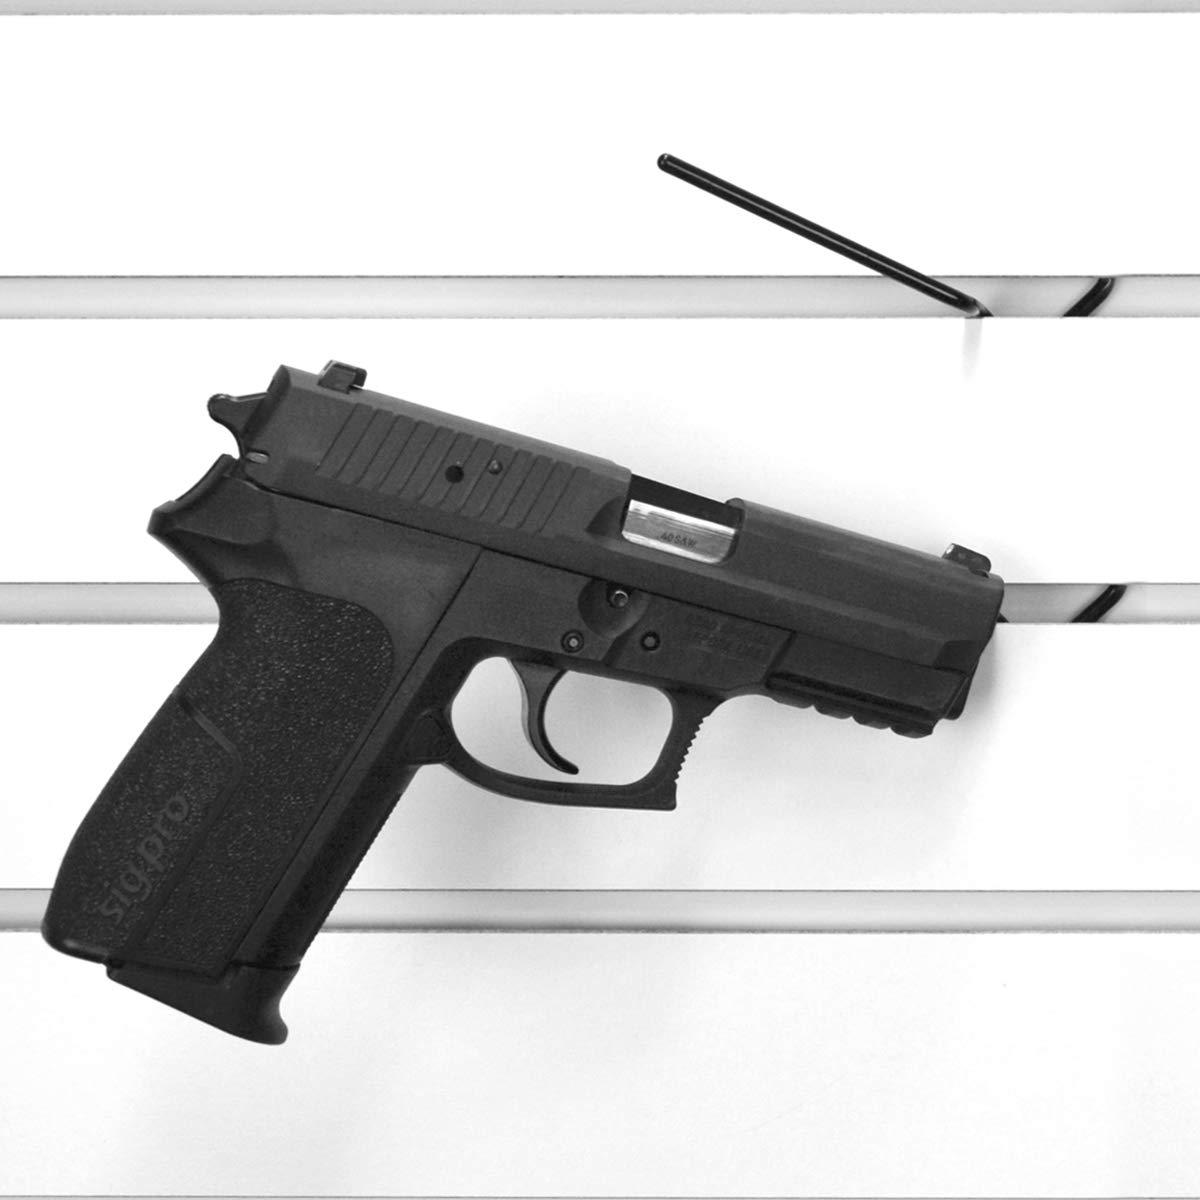 Slatwall Hook for Standard Slatwall Brackets, Pistol Rack Hook for Gun Display